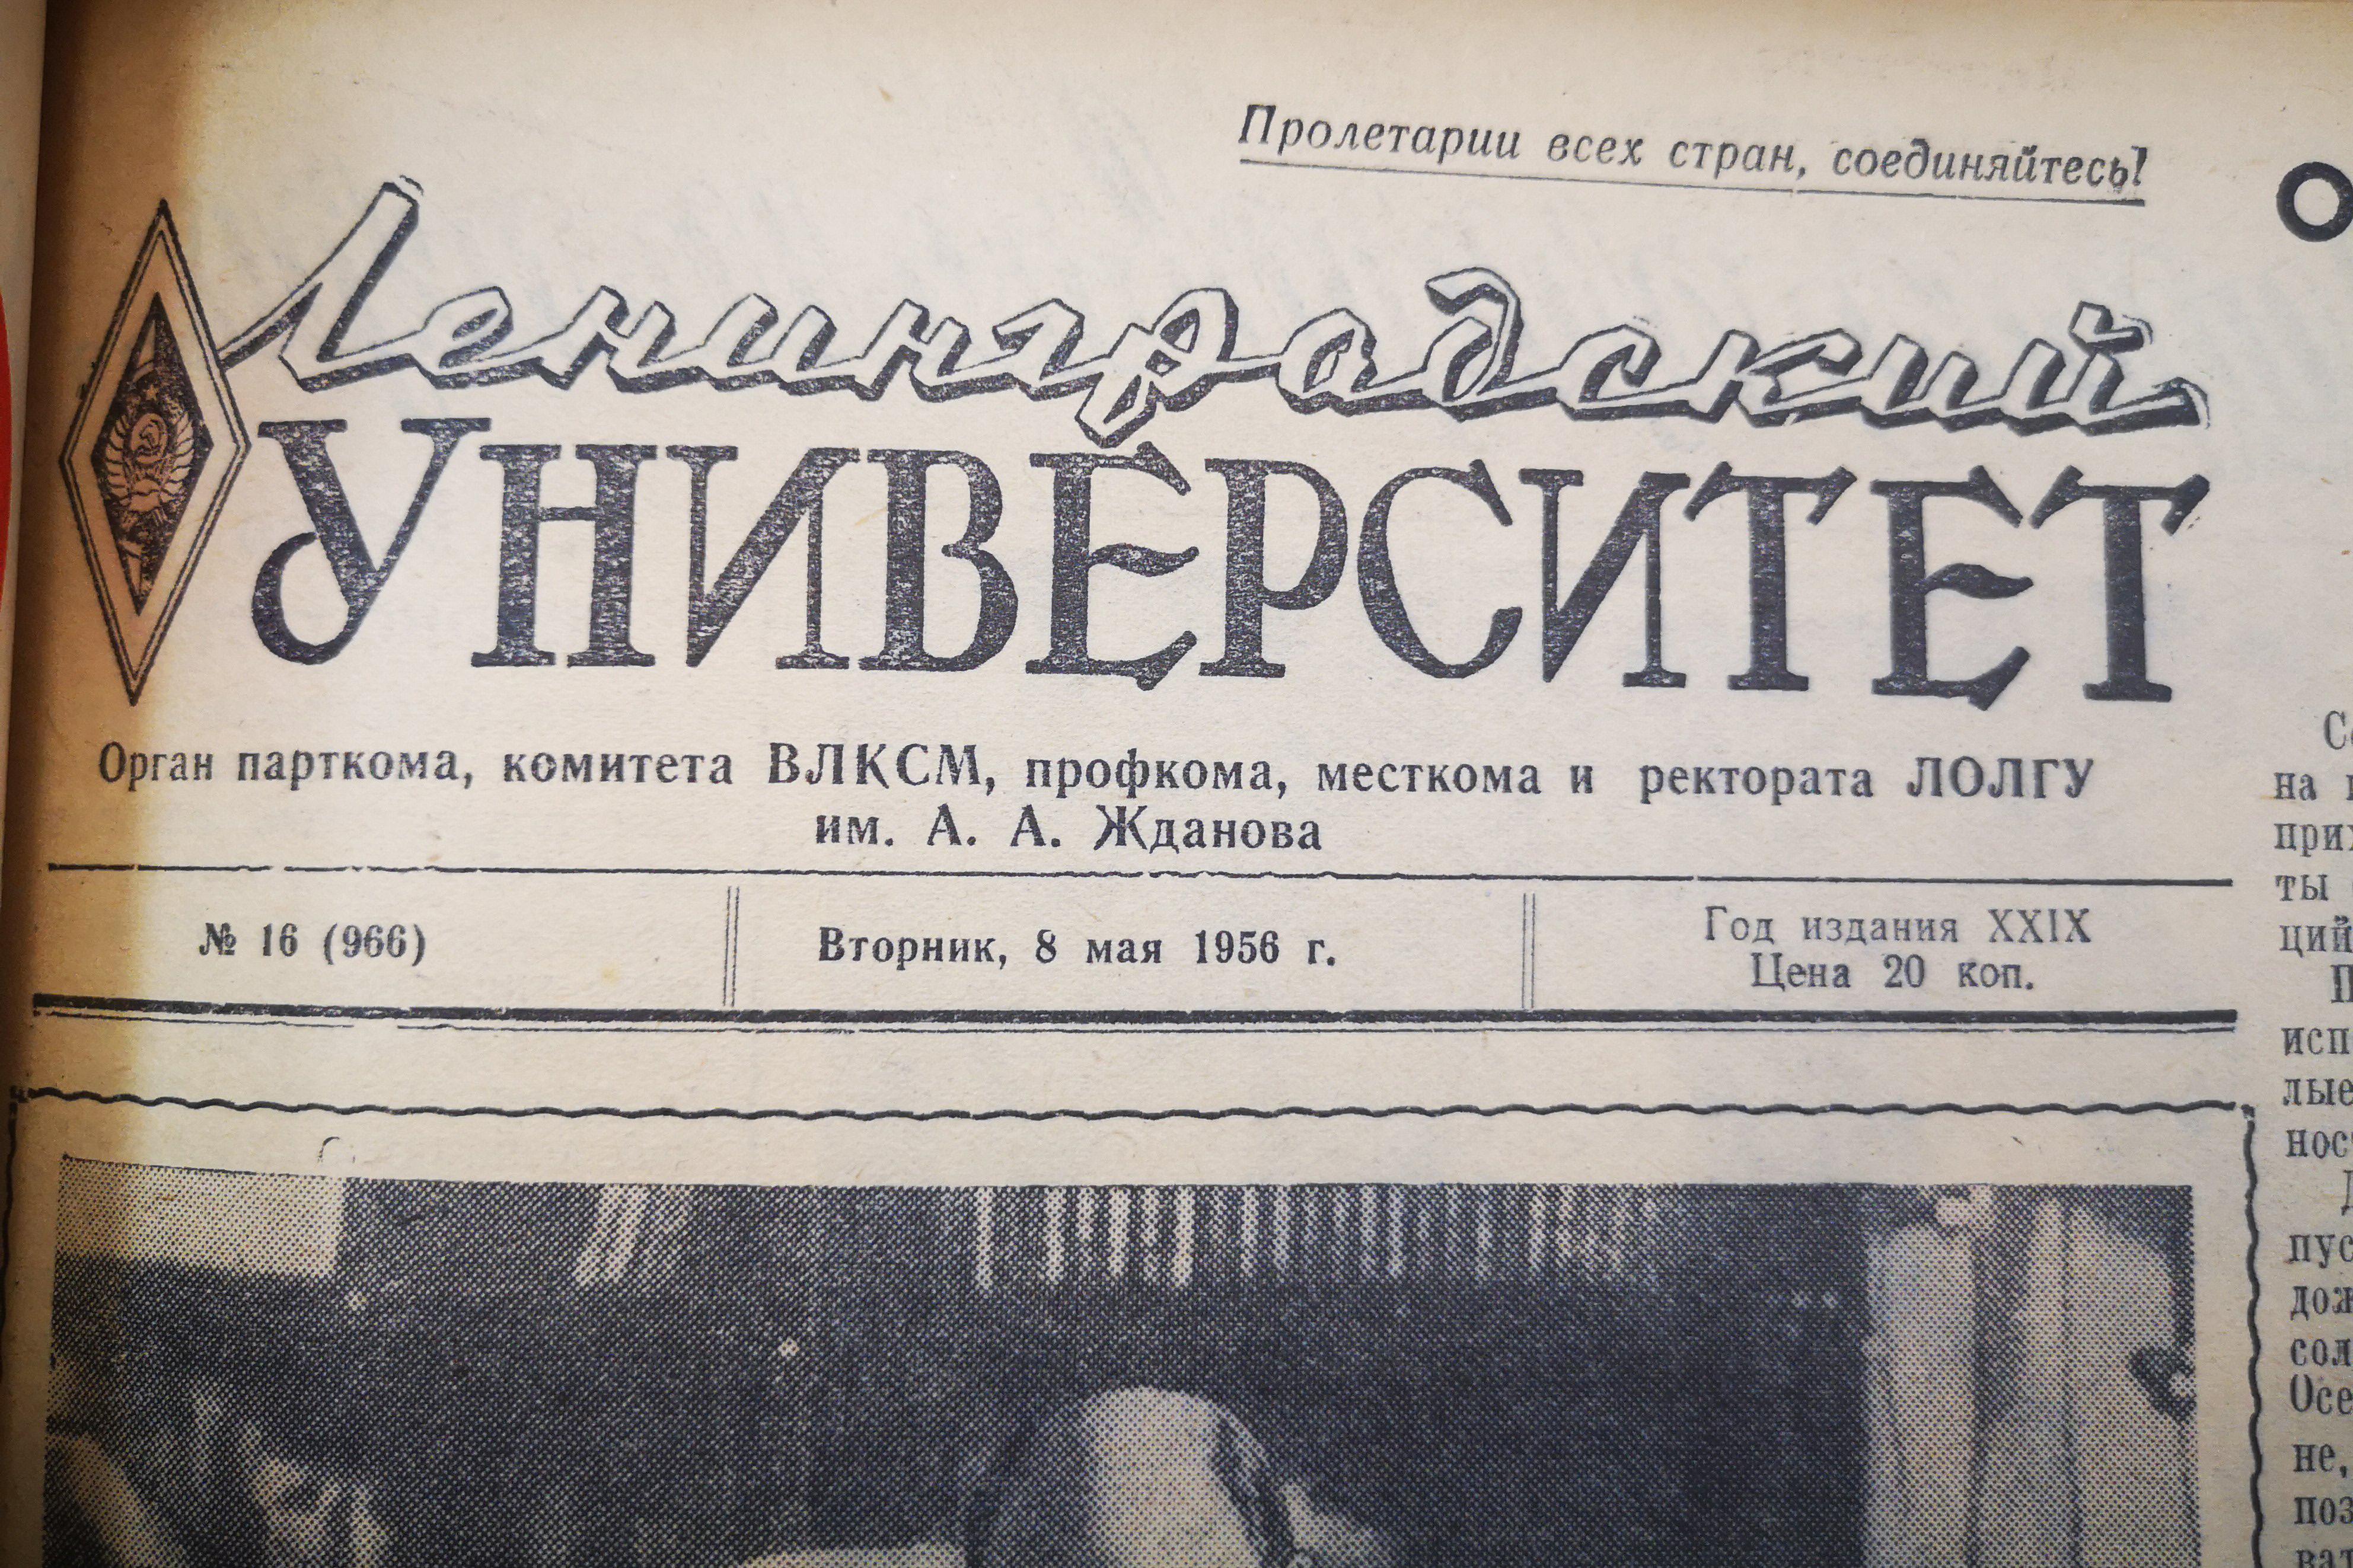 https://spbu.ru/sites/default/files/gazeta.jpg